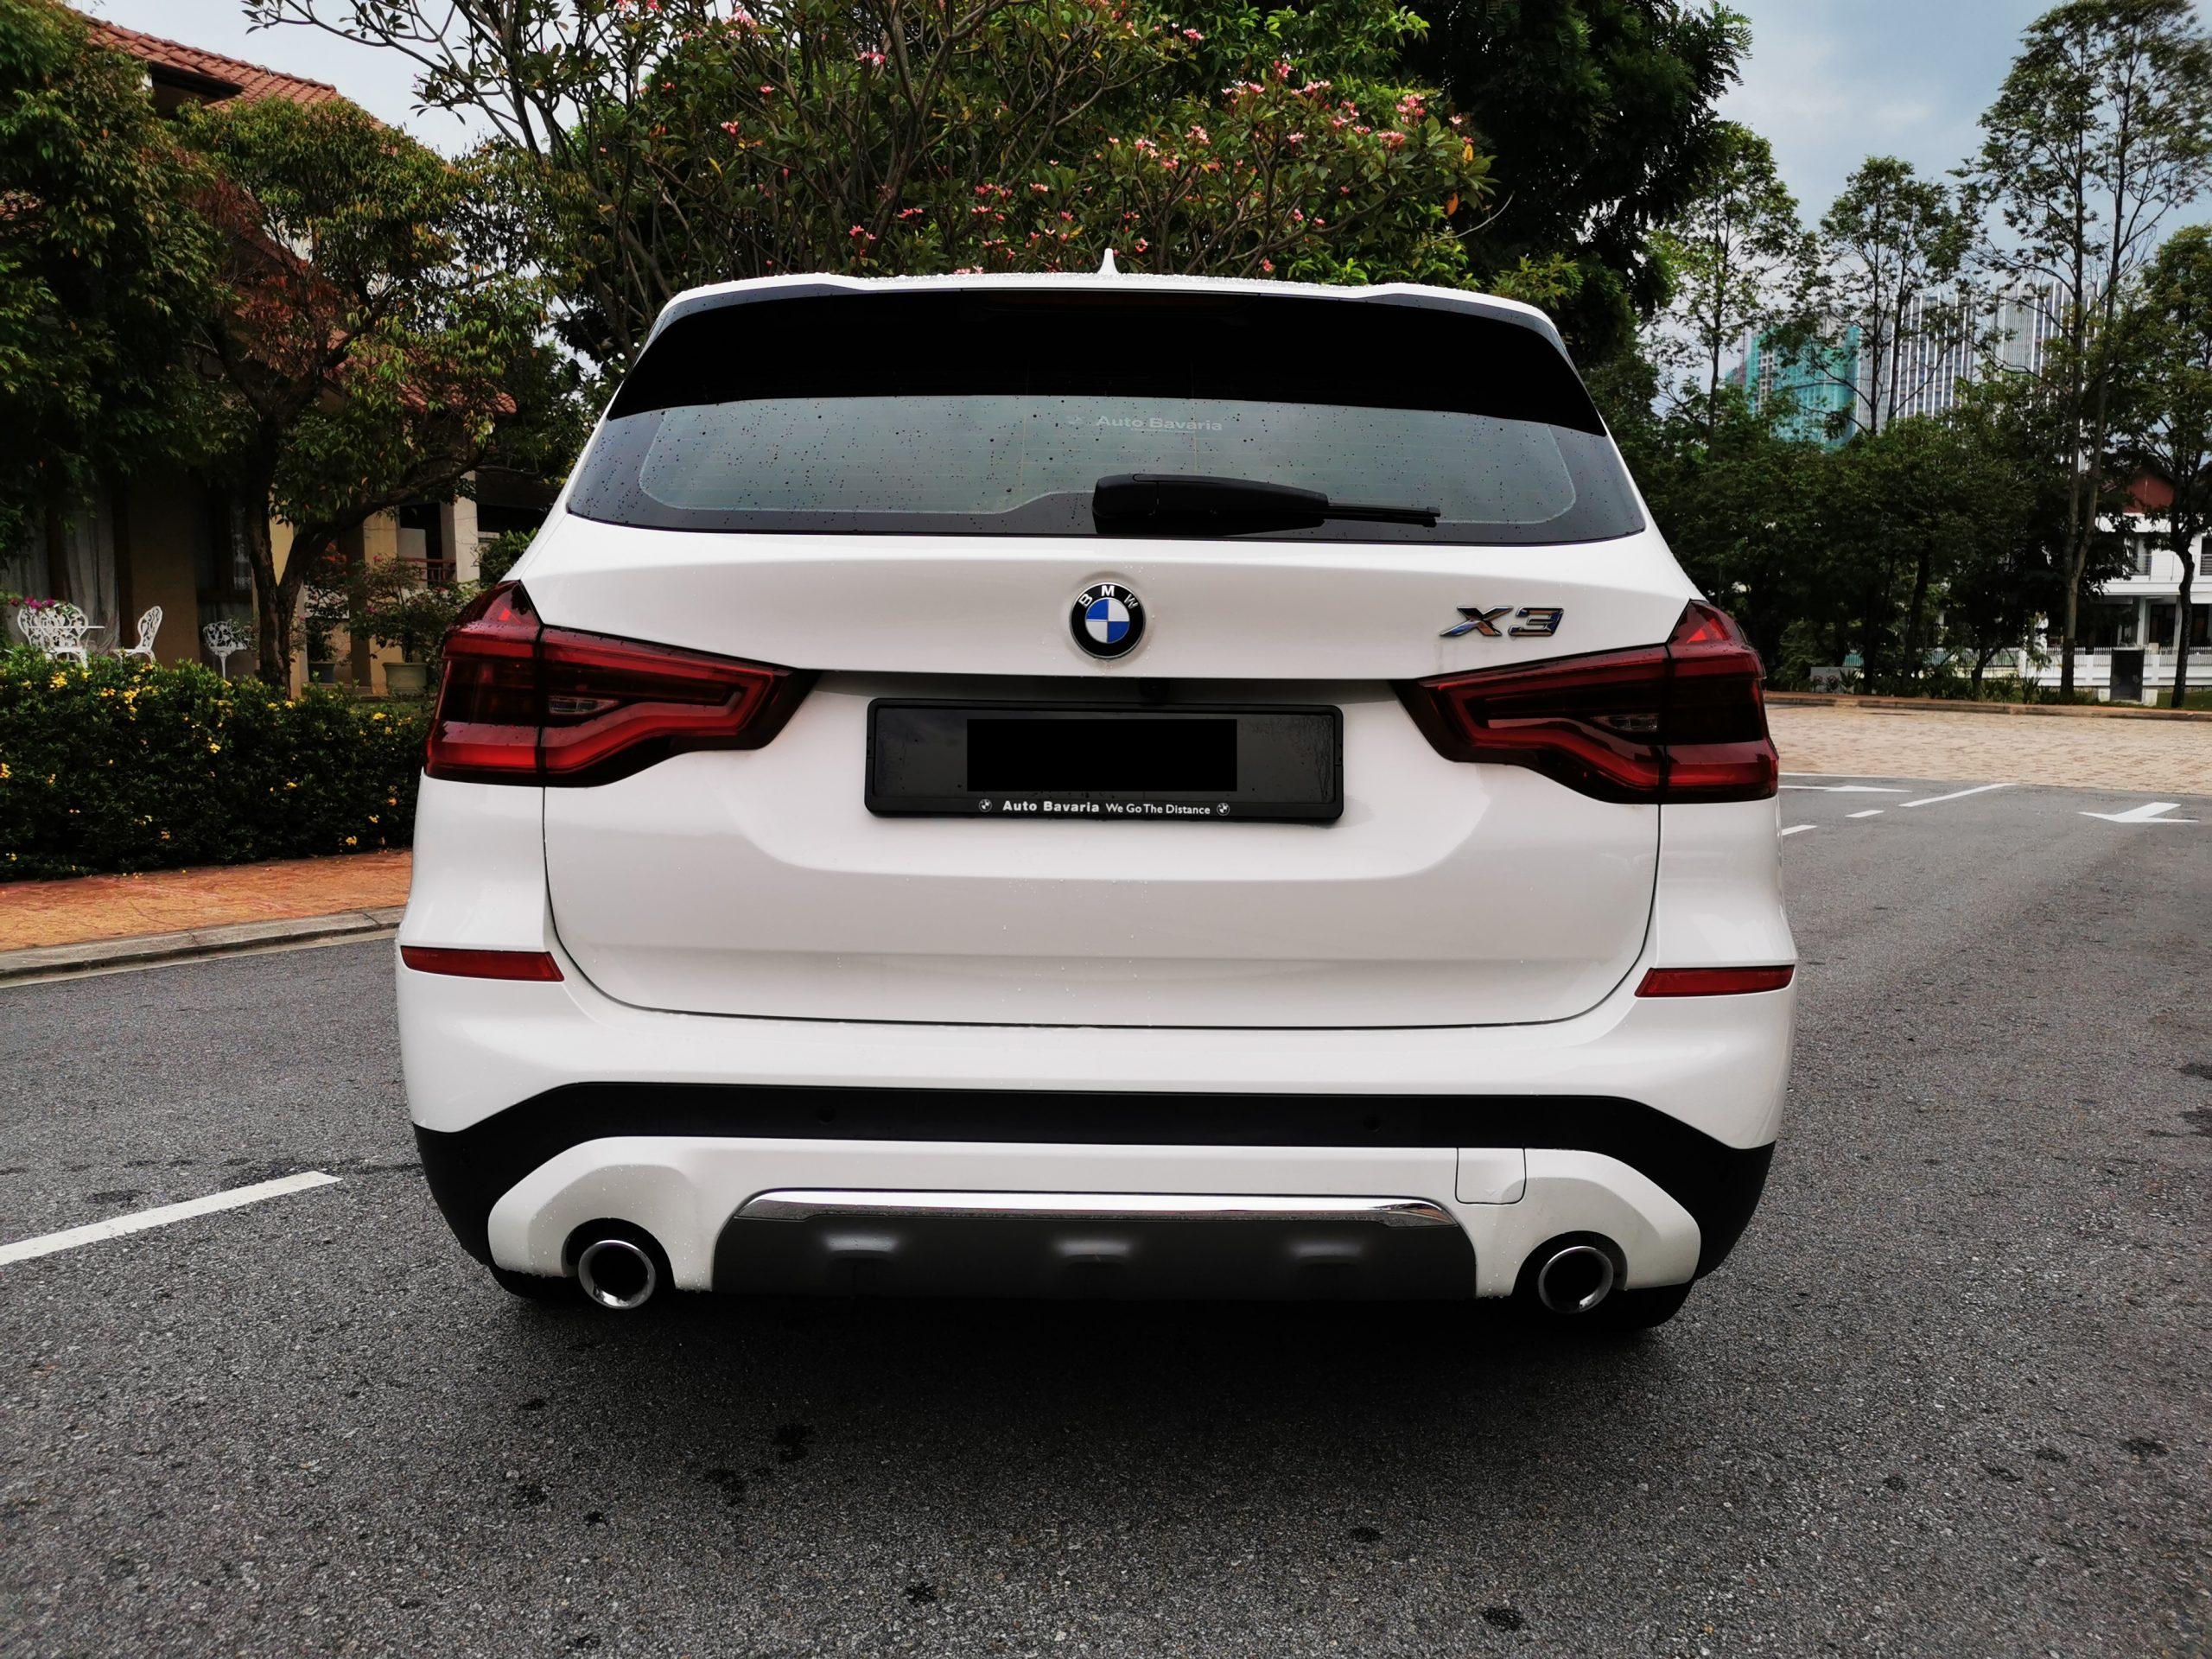 BMW X3 Back View